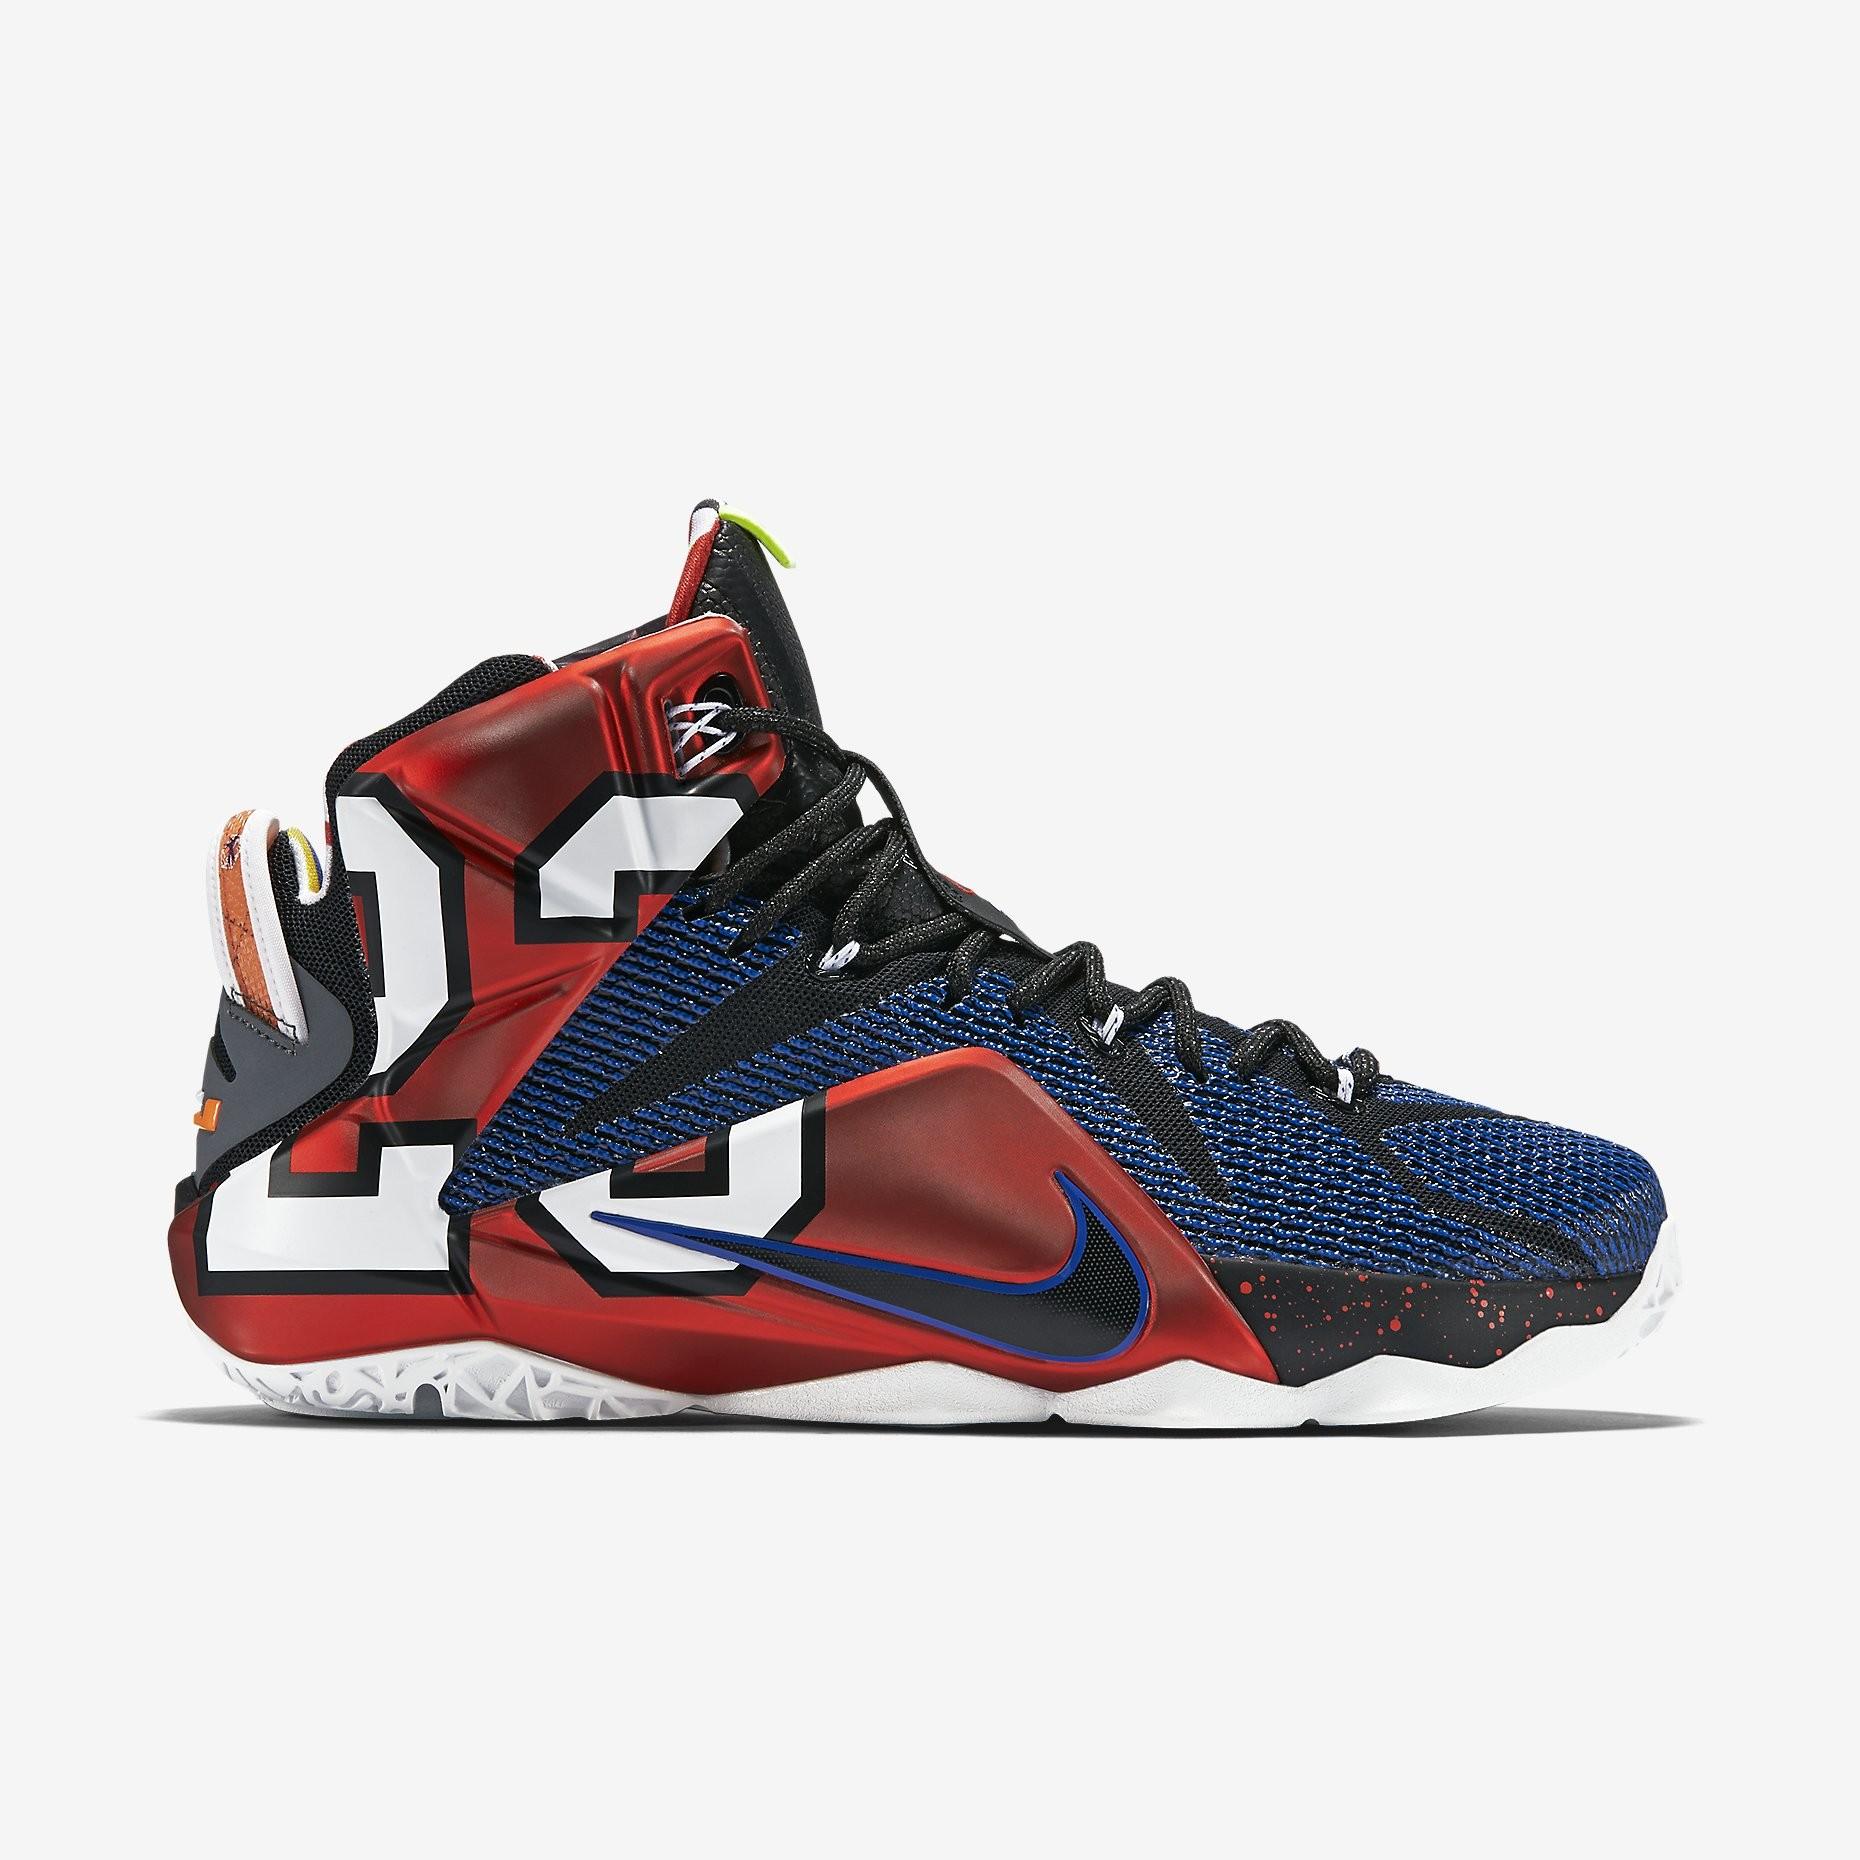 nuove scarpe lebron